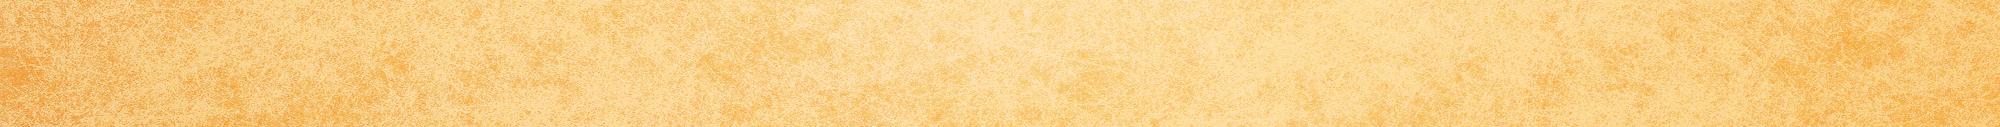 Slider Kontakt von Oskar Seus orange gemusterte Wand